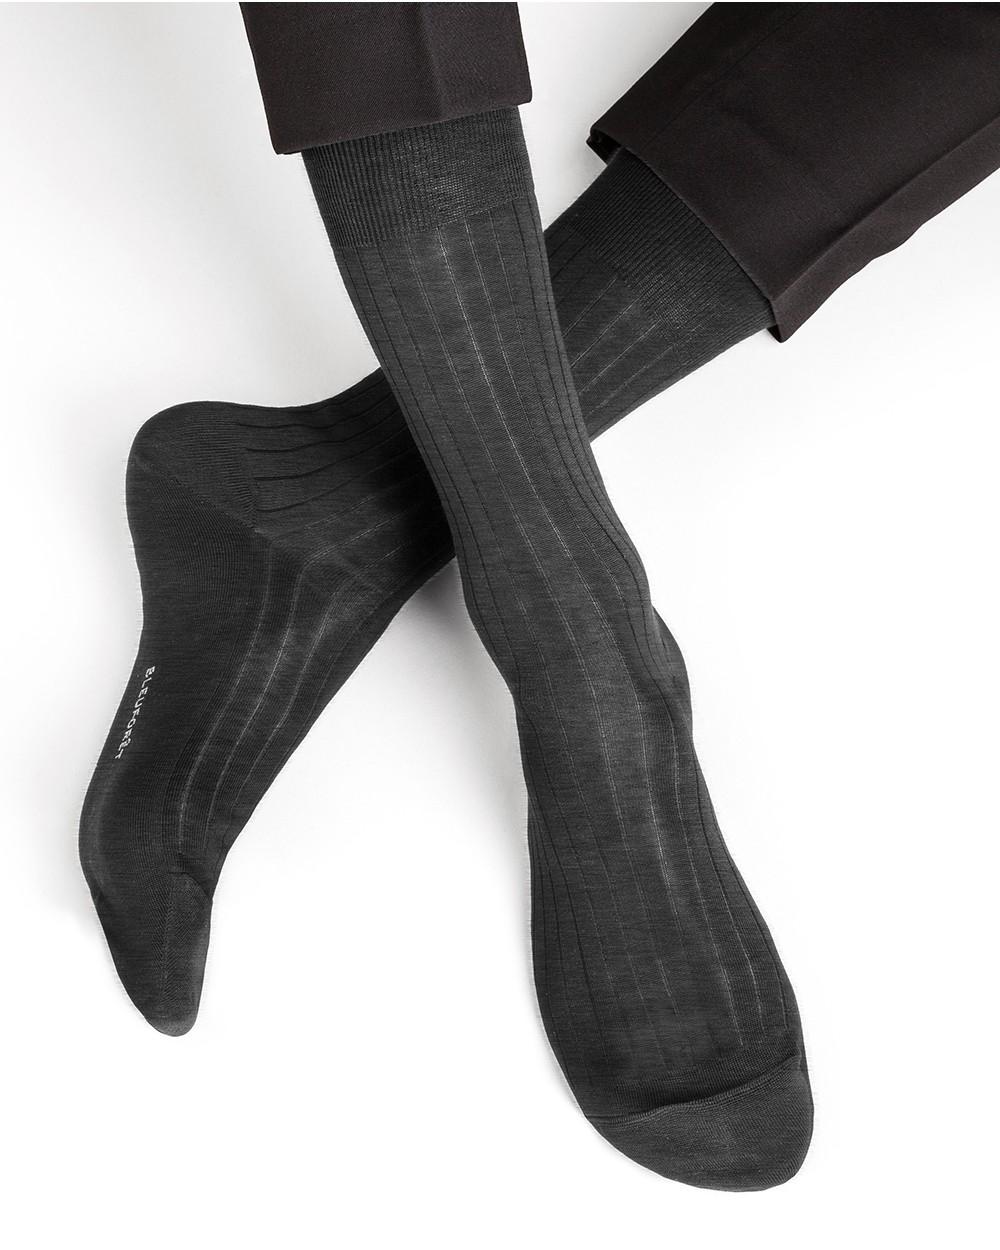 Chaussettes 100 Fil D Ecosse A Cotes Dress Socks Sheer Socks Mens Dress Socks [ 1250 x 1000 Pixel ]